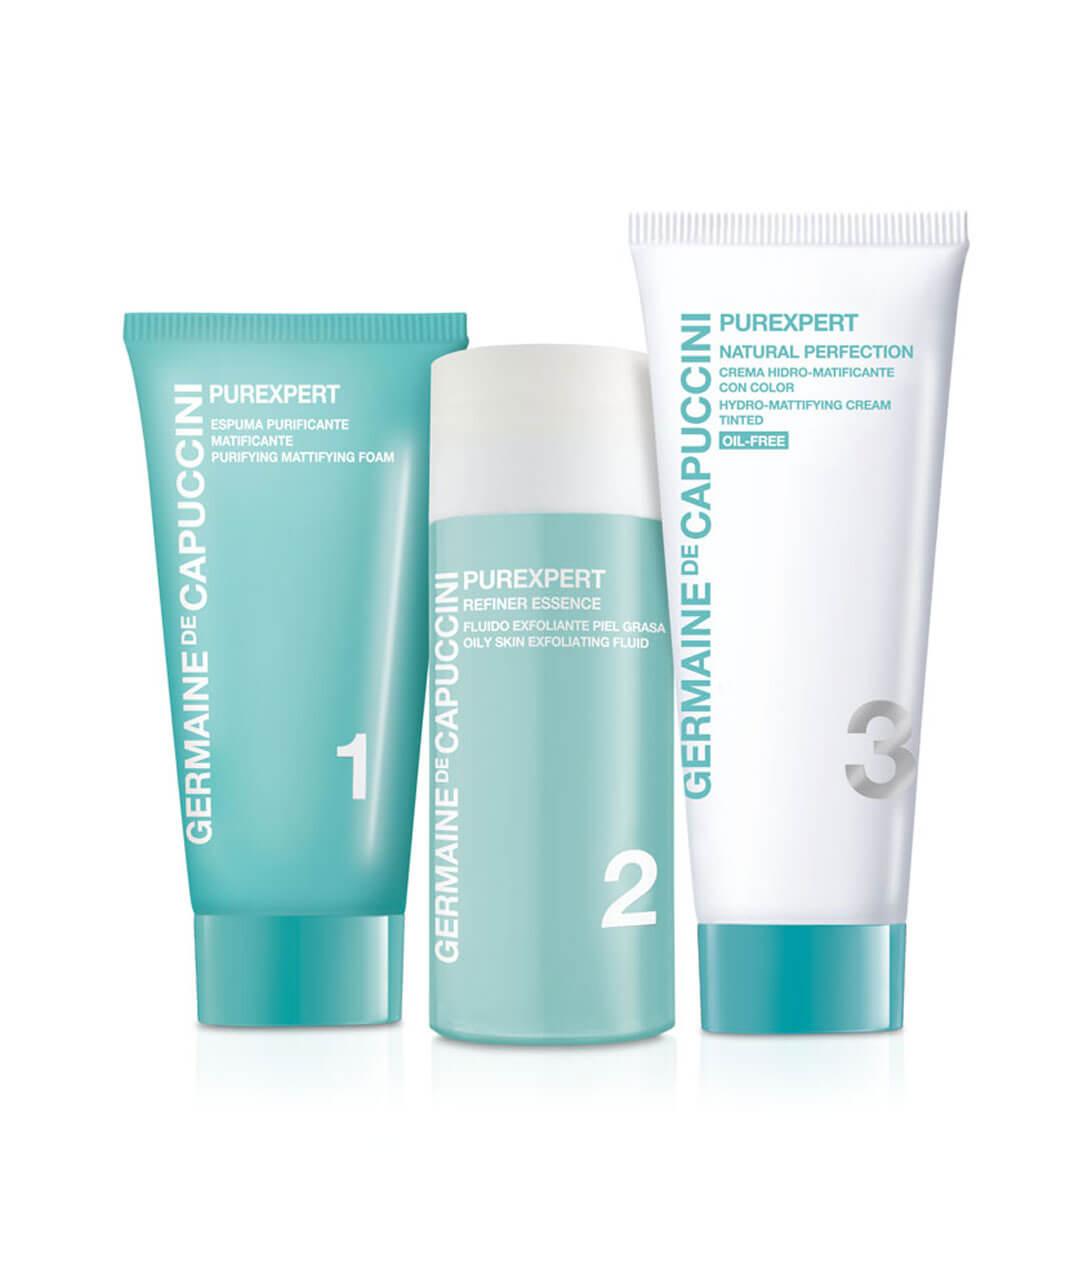 Purexpert Crema Natural Perfect c/ Color (pieles normales y mixtas)